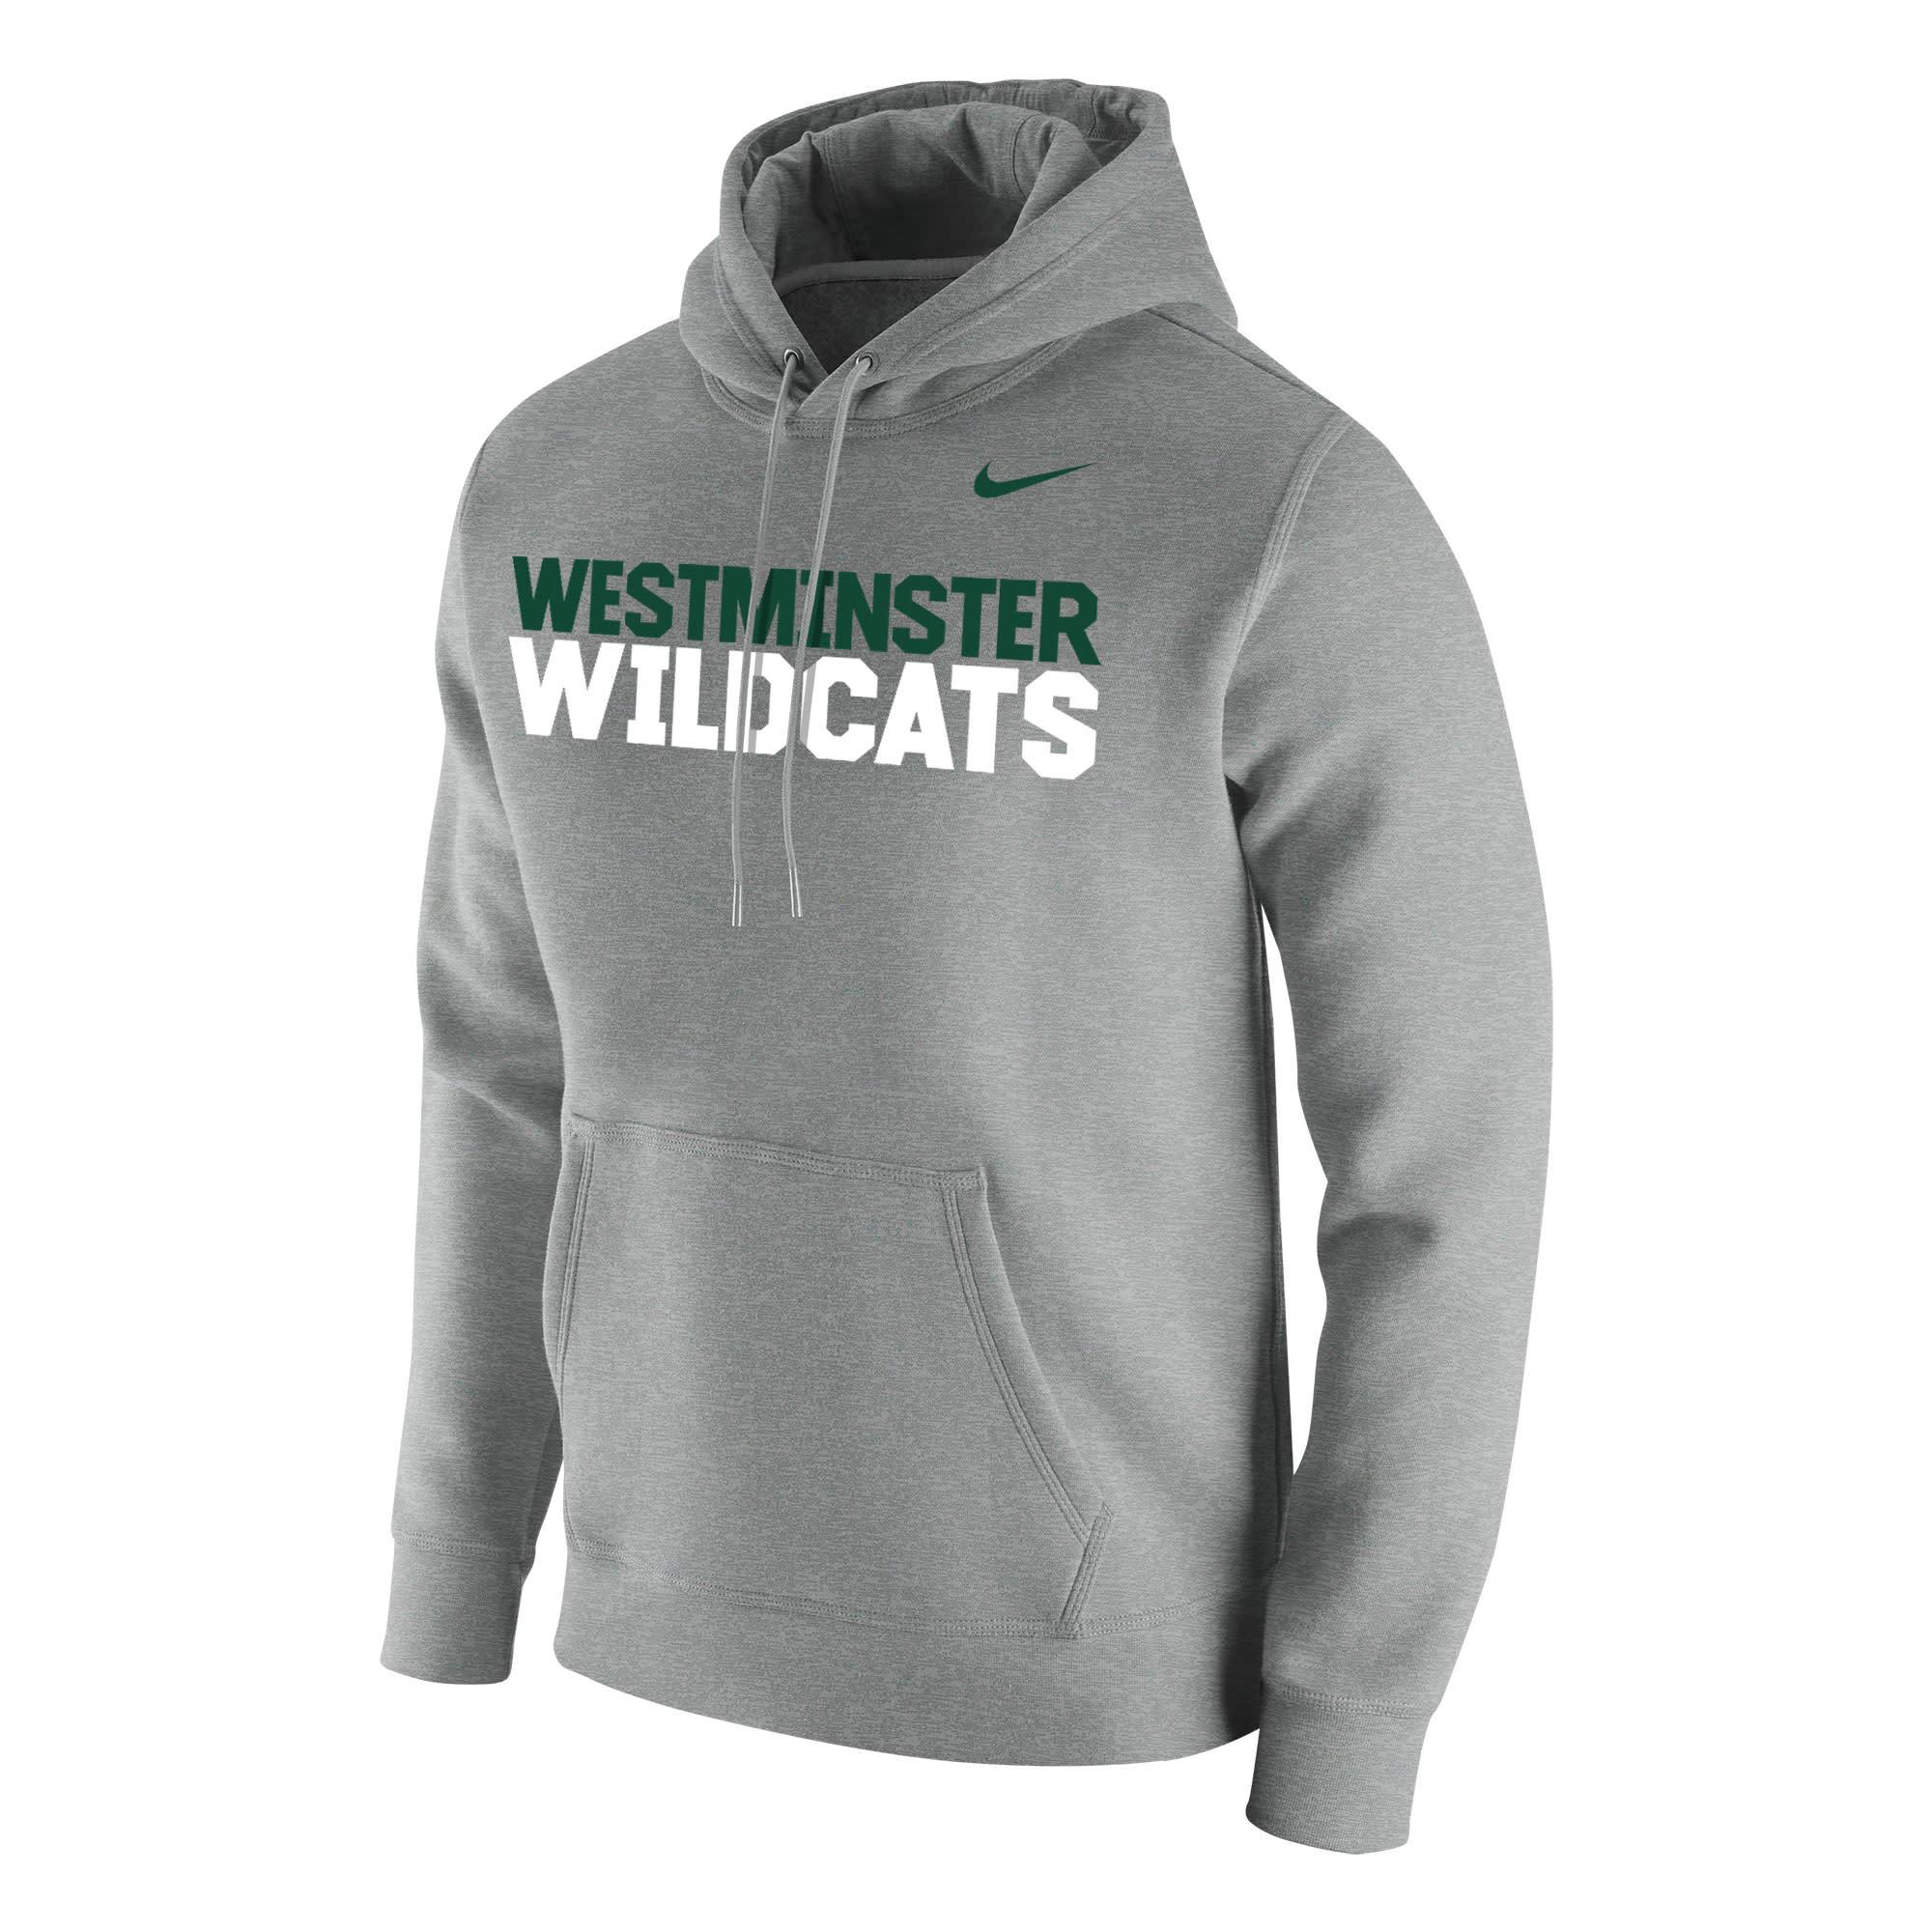 "Sweatshirt: Nike Club Fleece PO Hoody w/Dual Color ""Westminster Wildcats"""